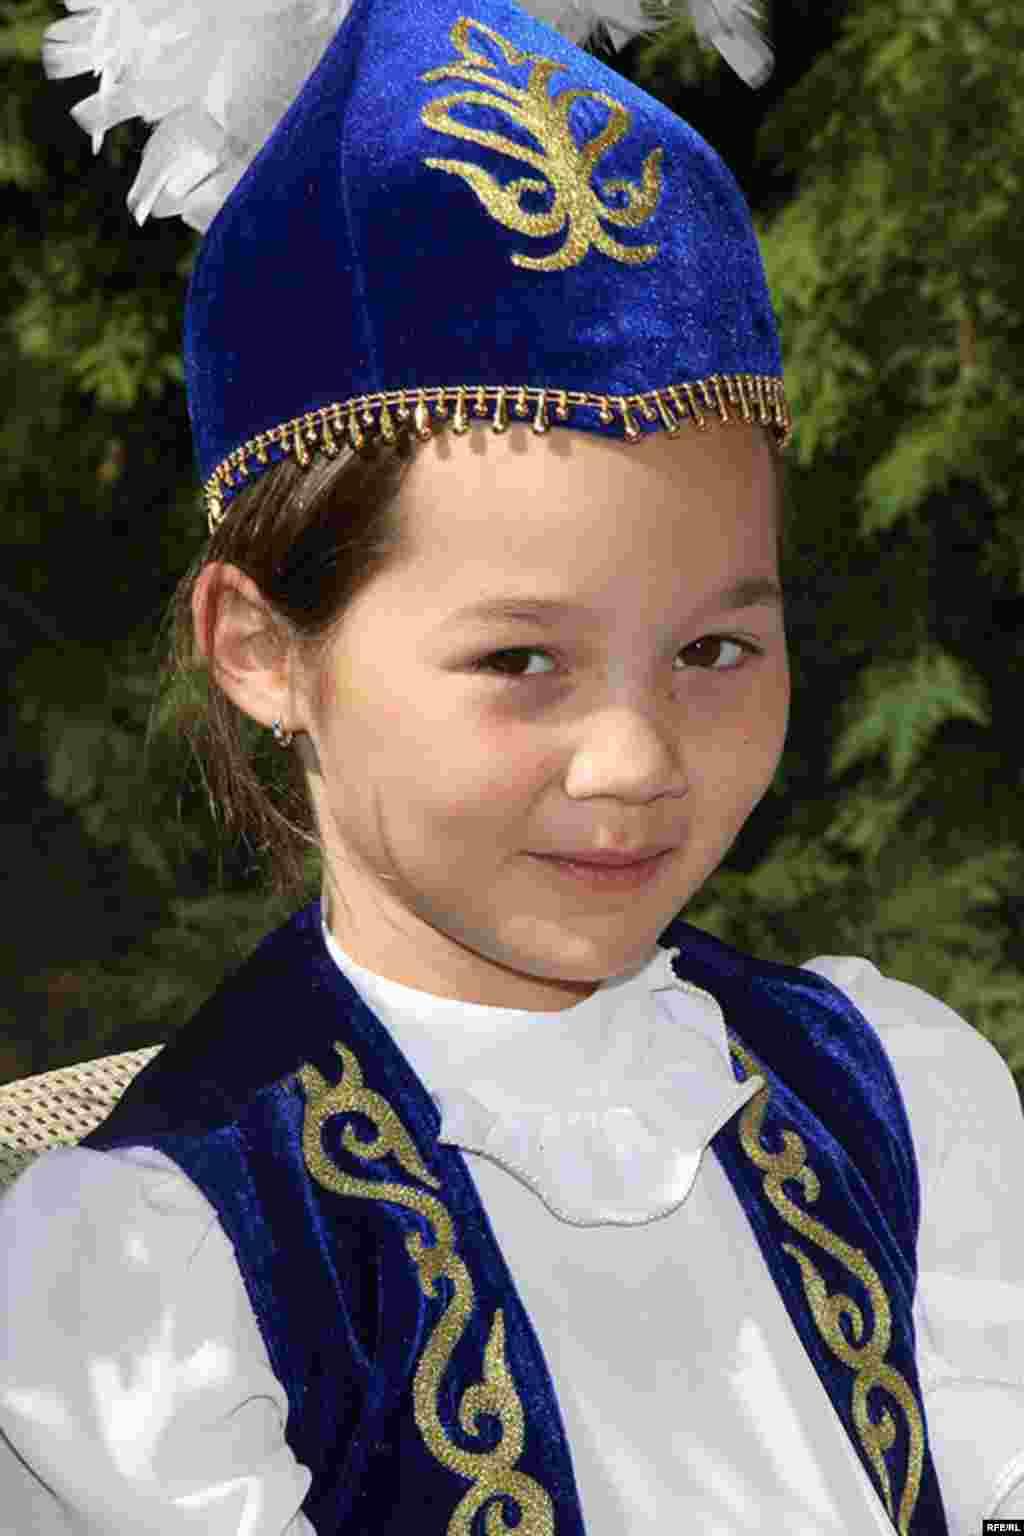 Қандай ән айтсам екен -ә! - Kazakhstan-Kazakh Service Web Party, Kazakh Girl Wearing Kazakh Costume